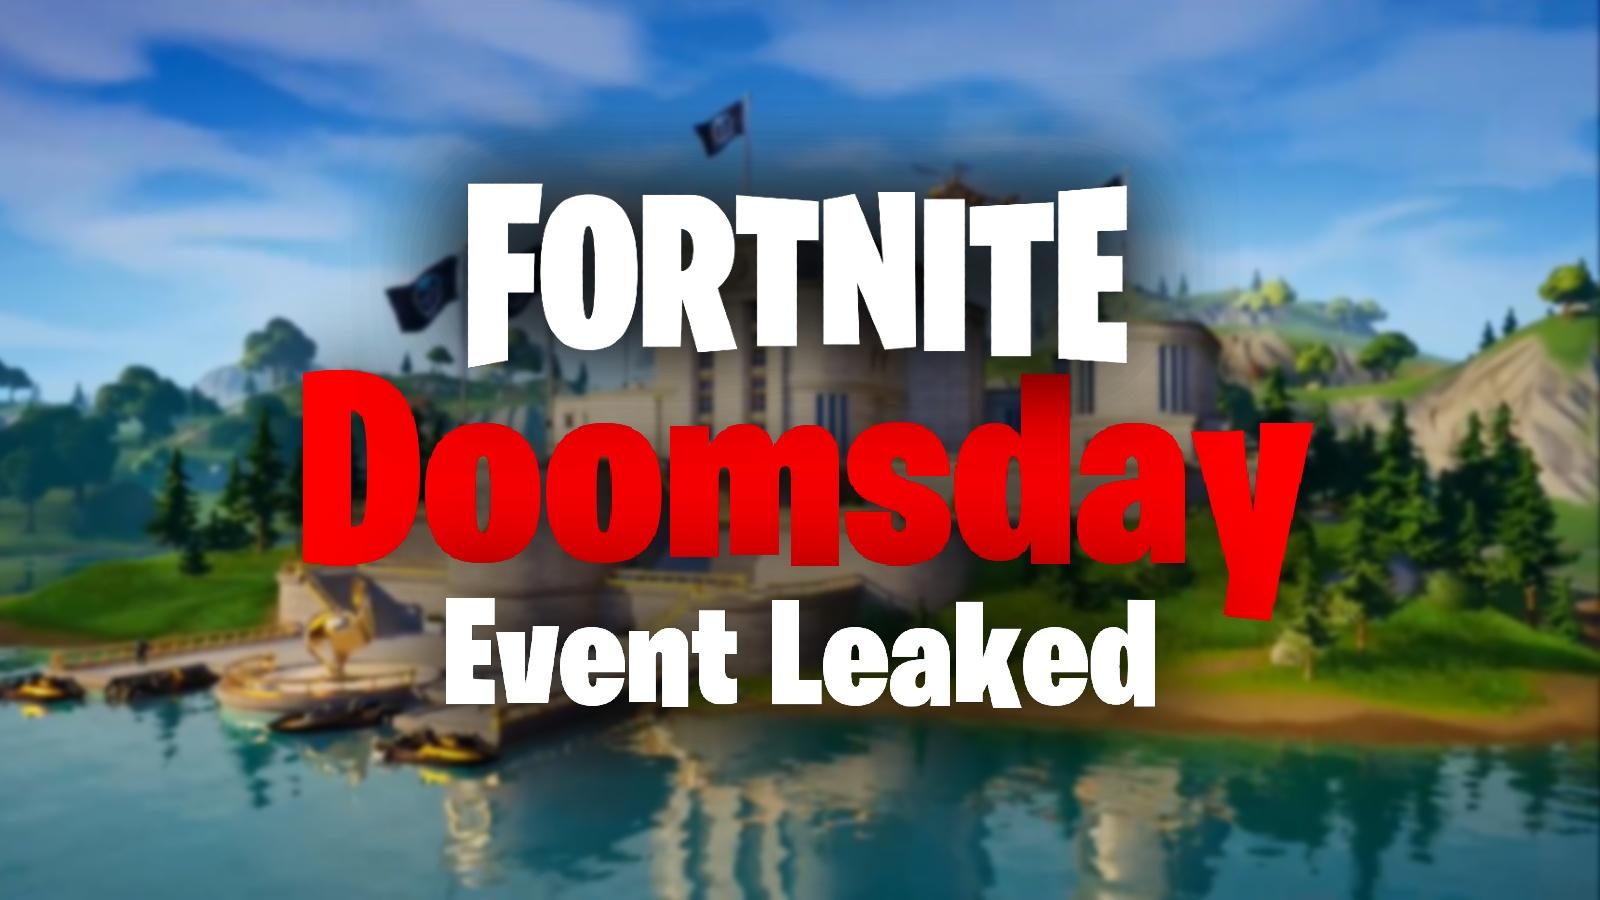 Fortnite Doomsday Event Countdown And New Details Leaked Dexerto Ttl | stw | fortnite leaks & news запись закреплена. fortnite doomsday event countdown and